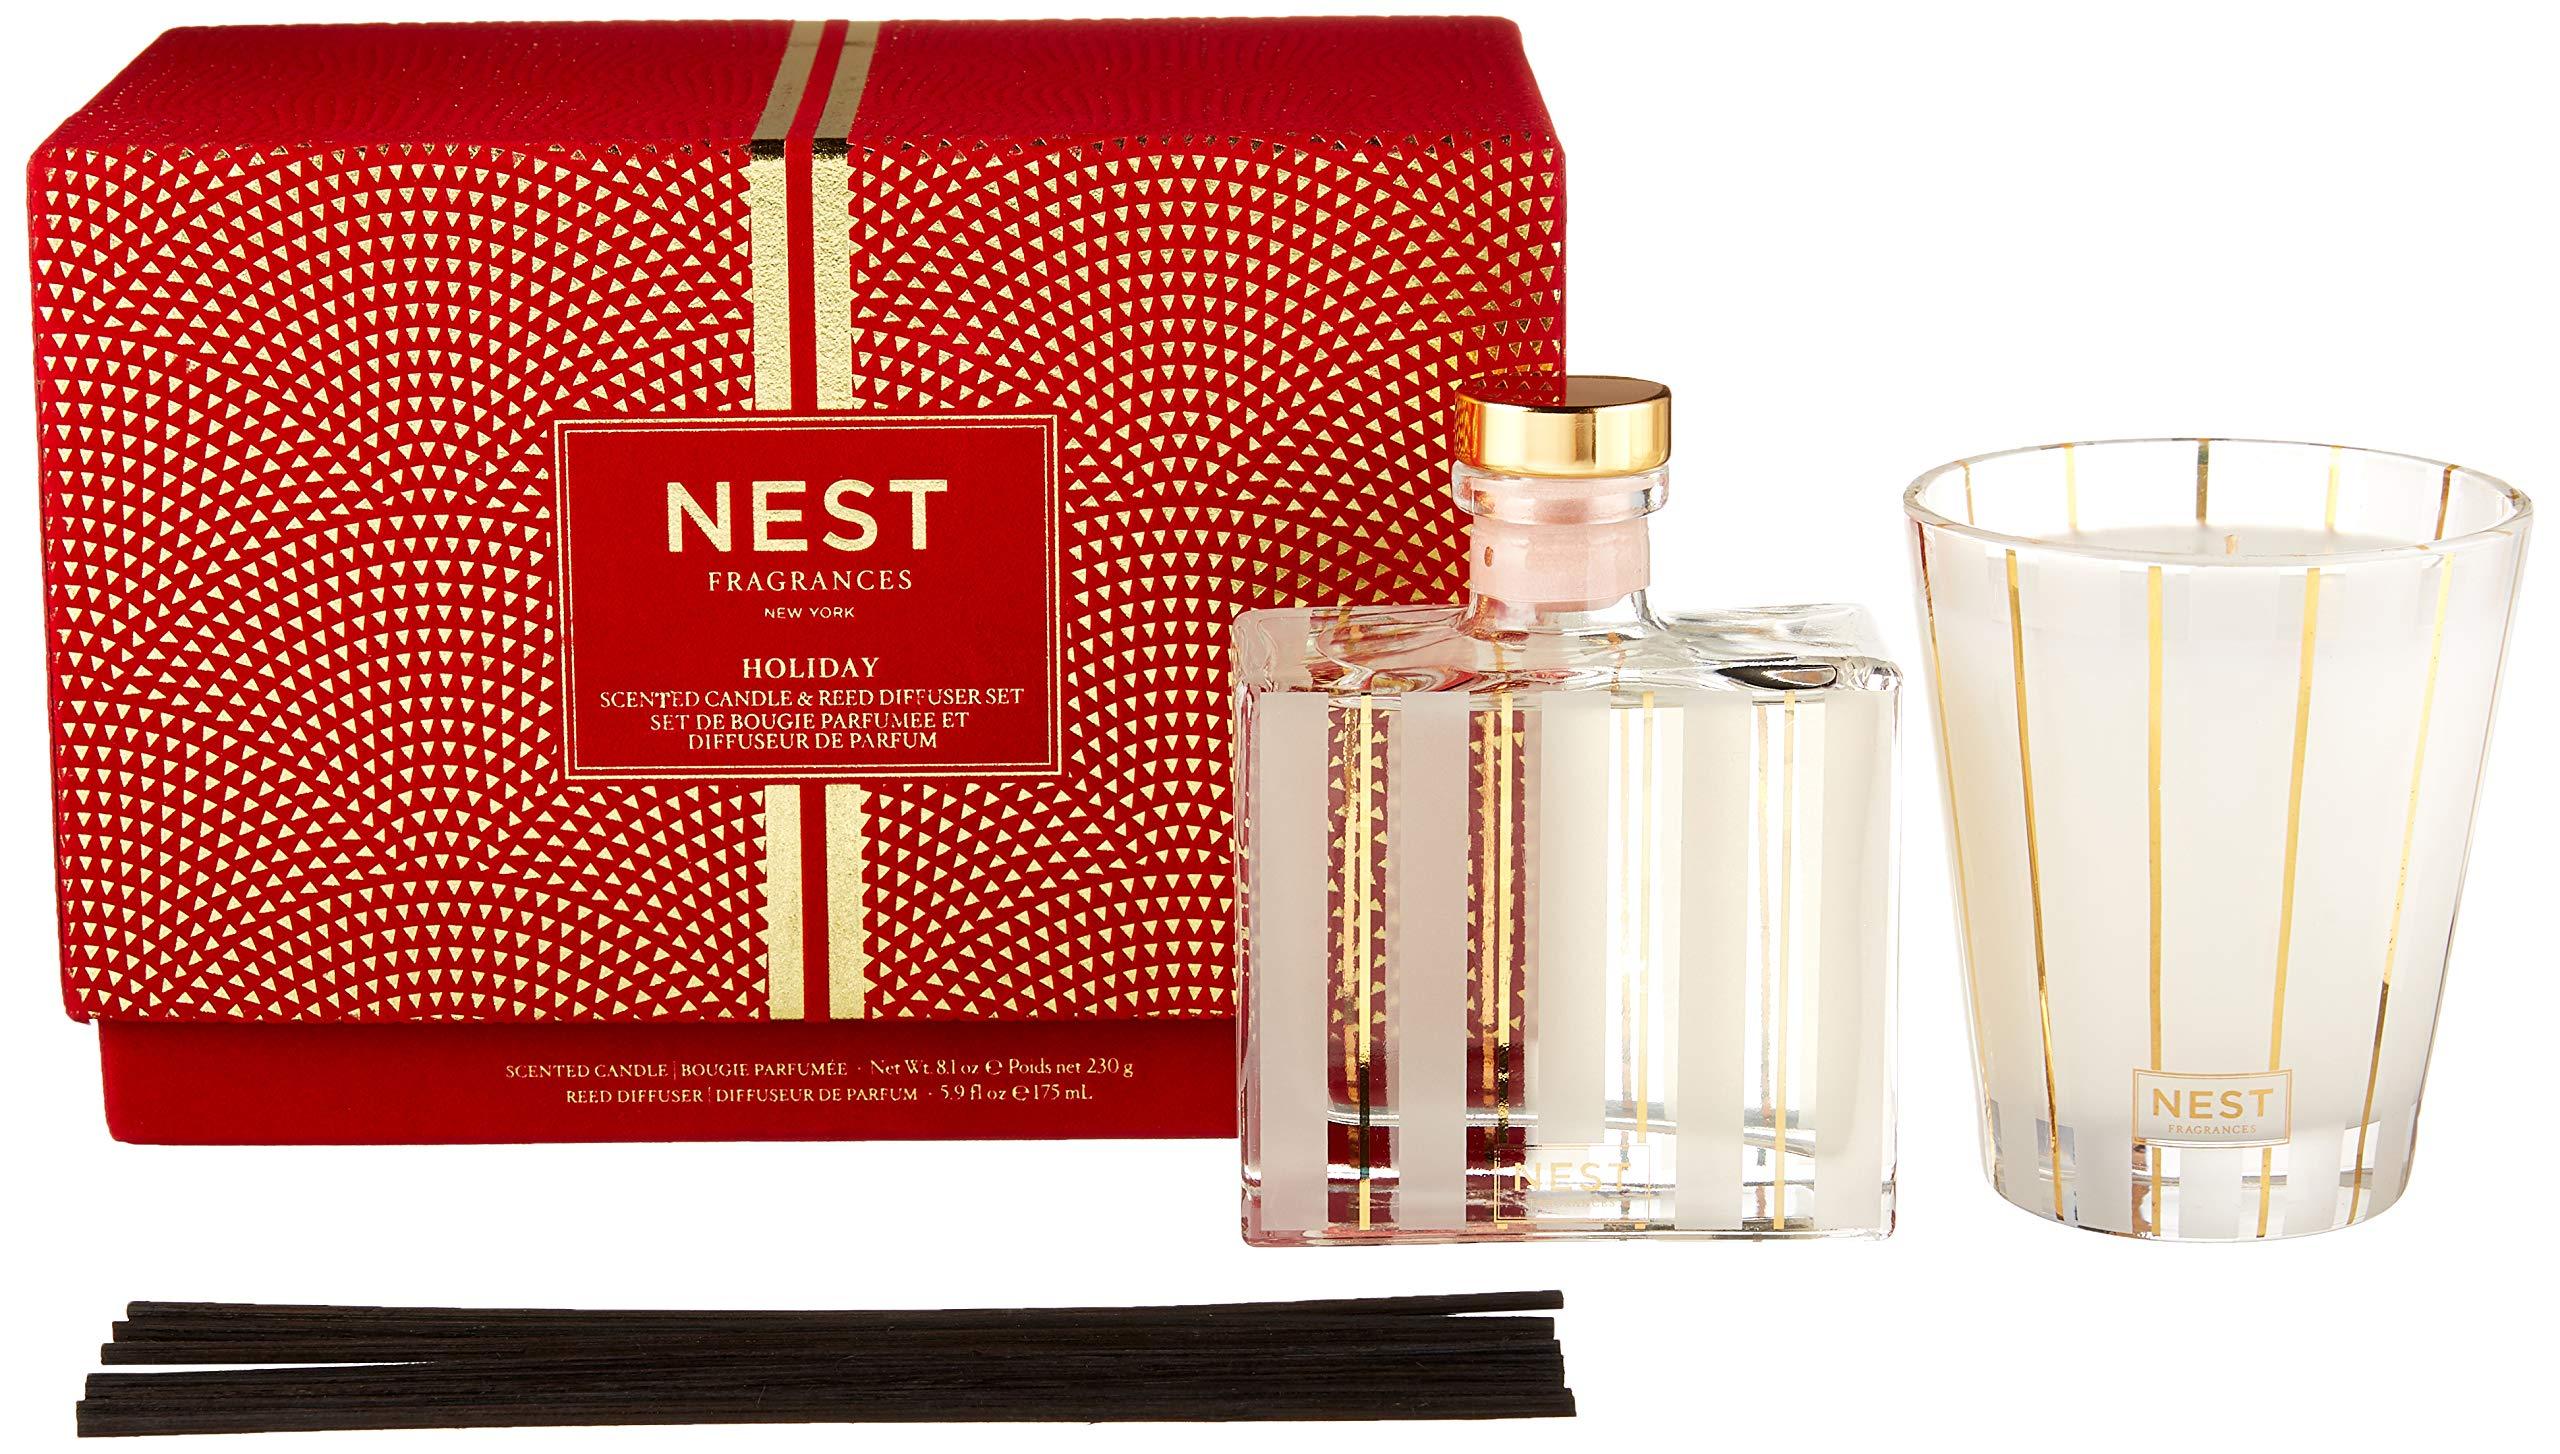 NEST Fragrances Candle & Reed Diffuser Set by NEST Fragrances